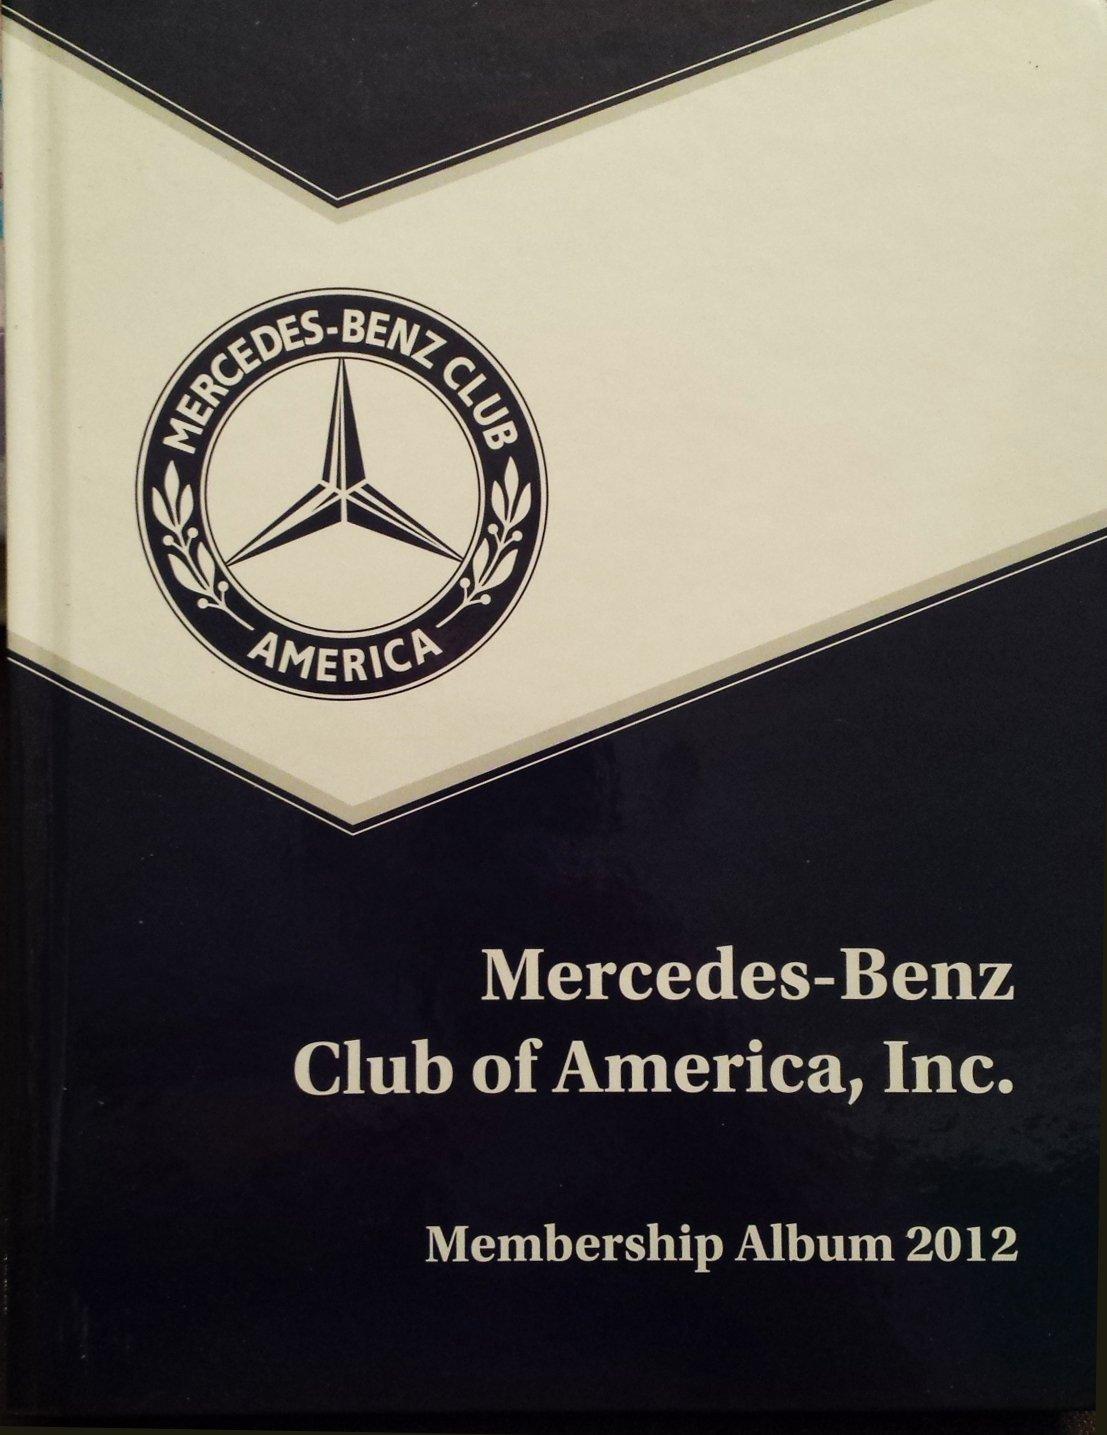 Mercedes Benz Club Of America Membership Album 2012: Mercedes Benz Club Of  America: Amazon.com: Books